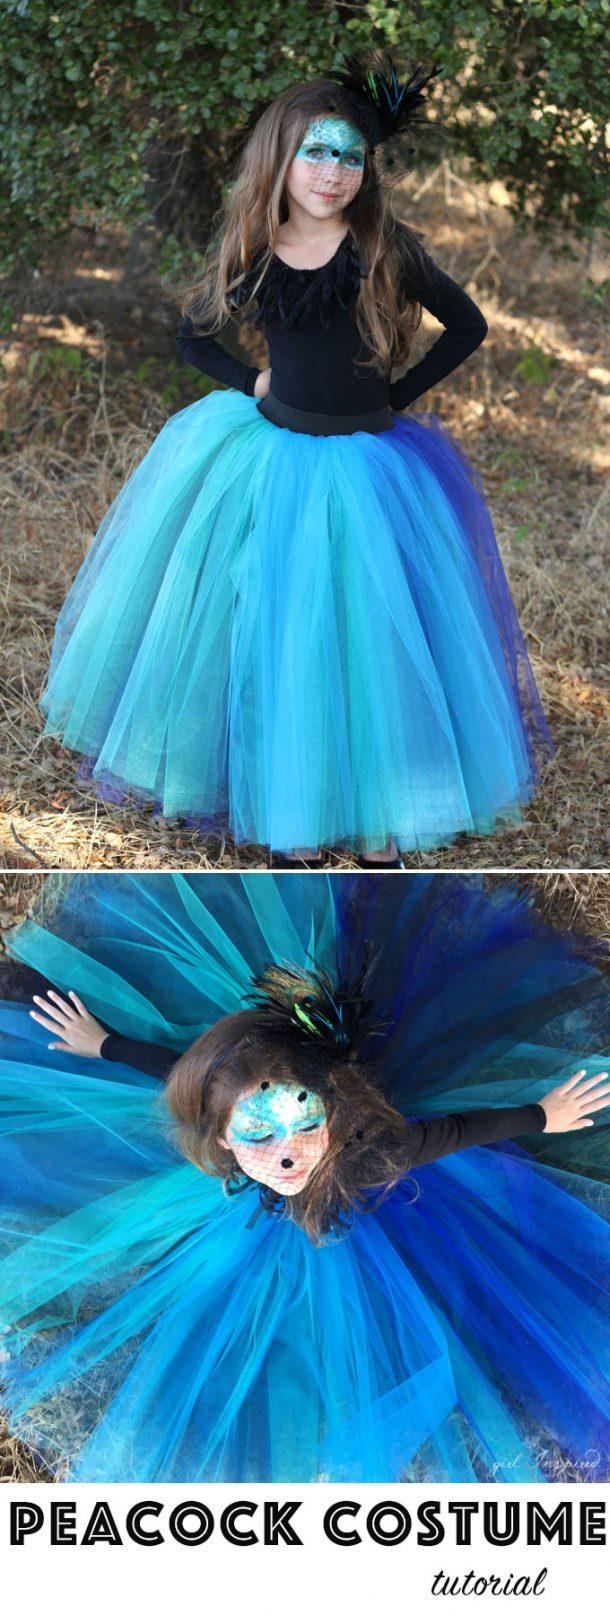 20 diy halloween costumes landeelu diy halloween costumes ideas beautiful and easy peacock long tutu costume diy tutorial via girl solutioingenieria Image collections